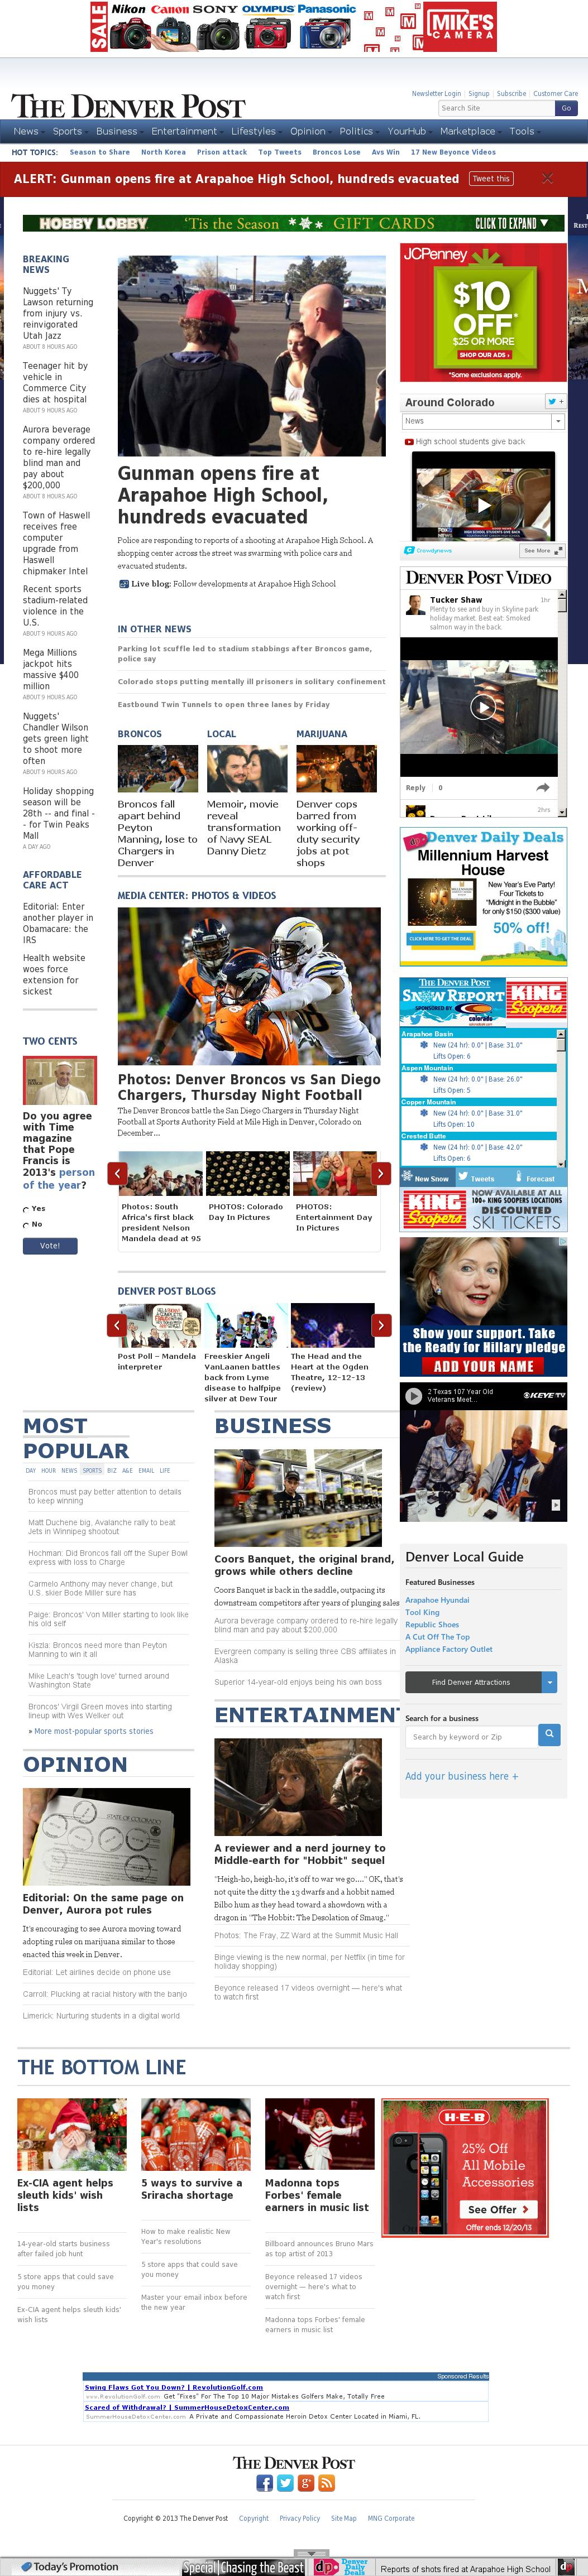 Denver Post at Friday Dec. 13, 2013, 9:03 p.m. UTC